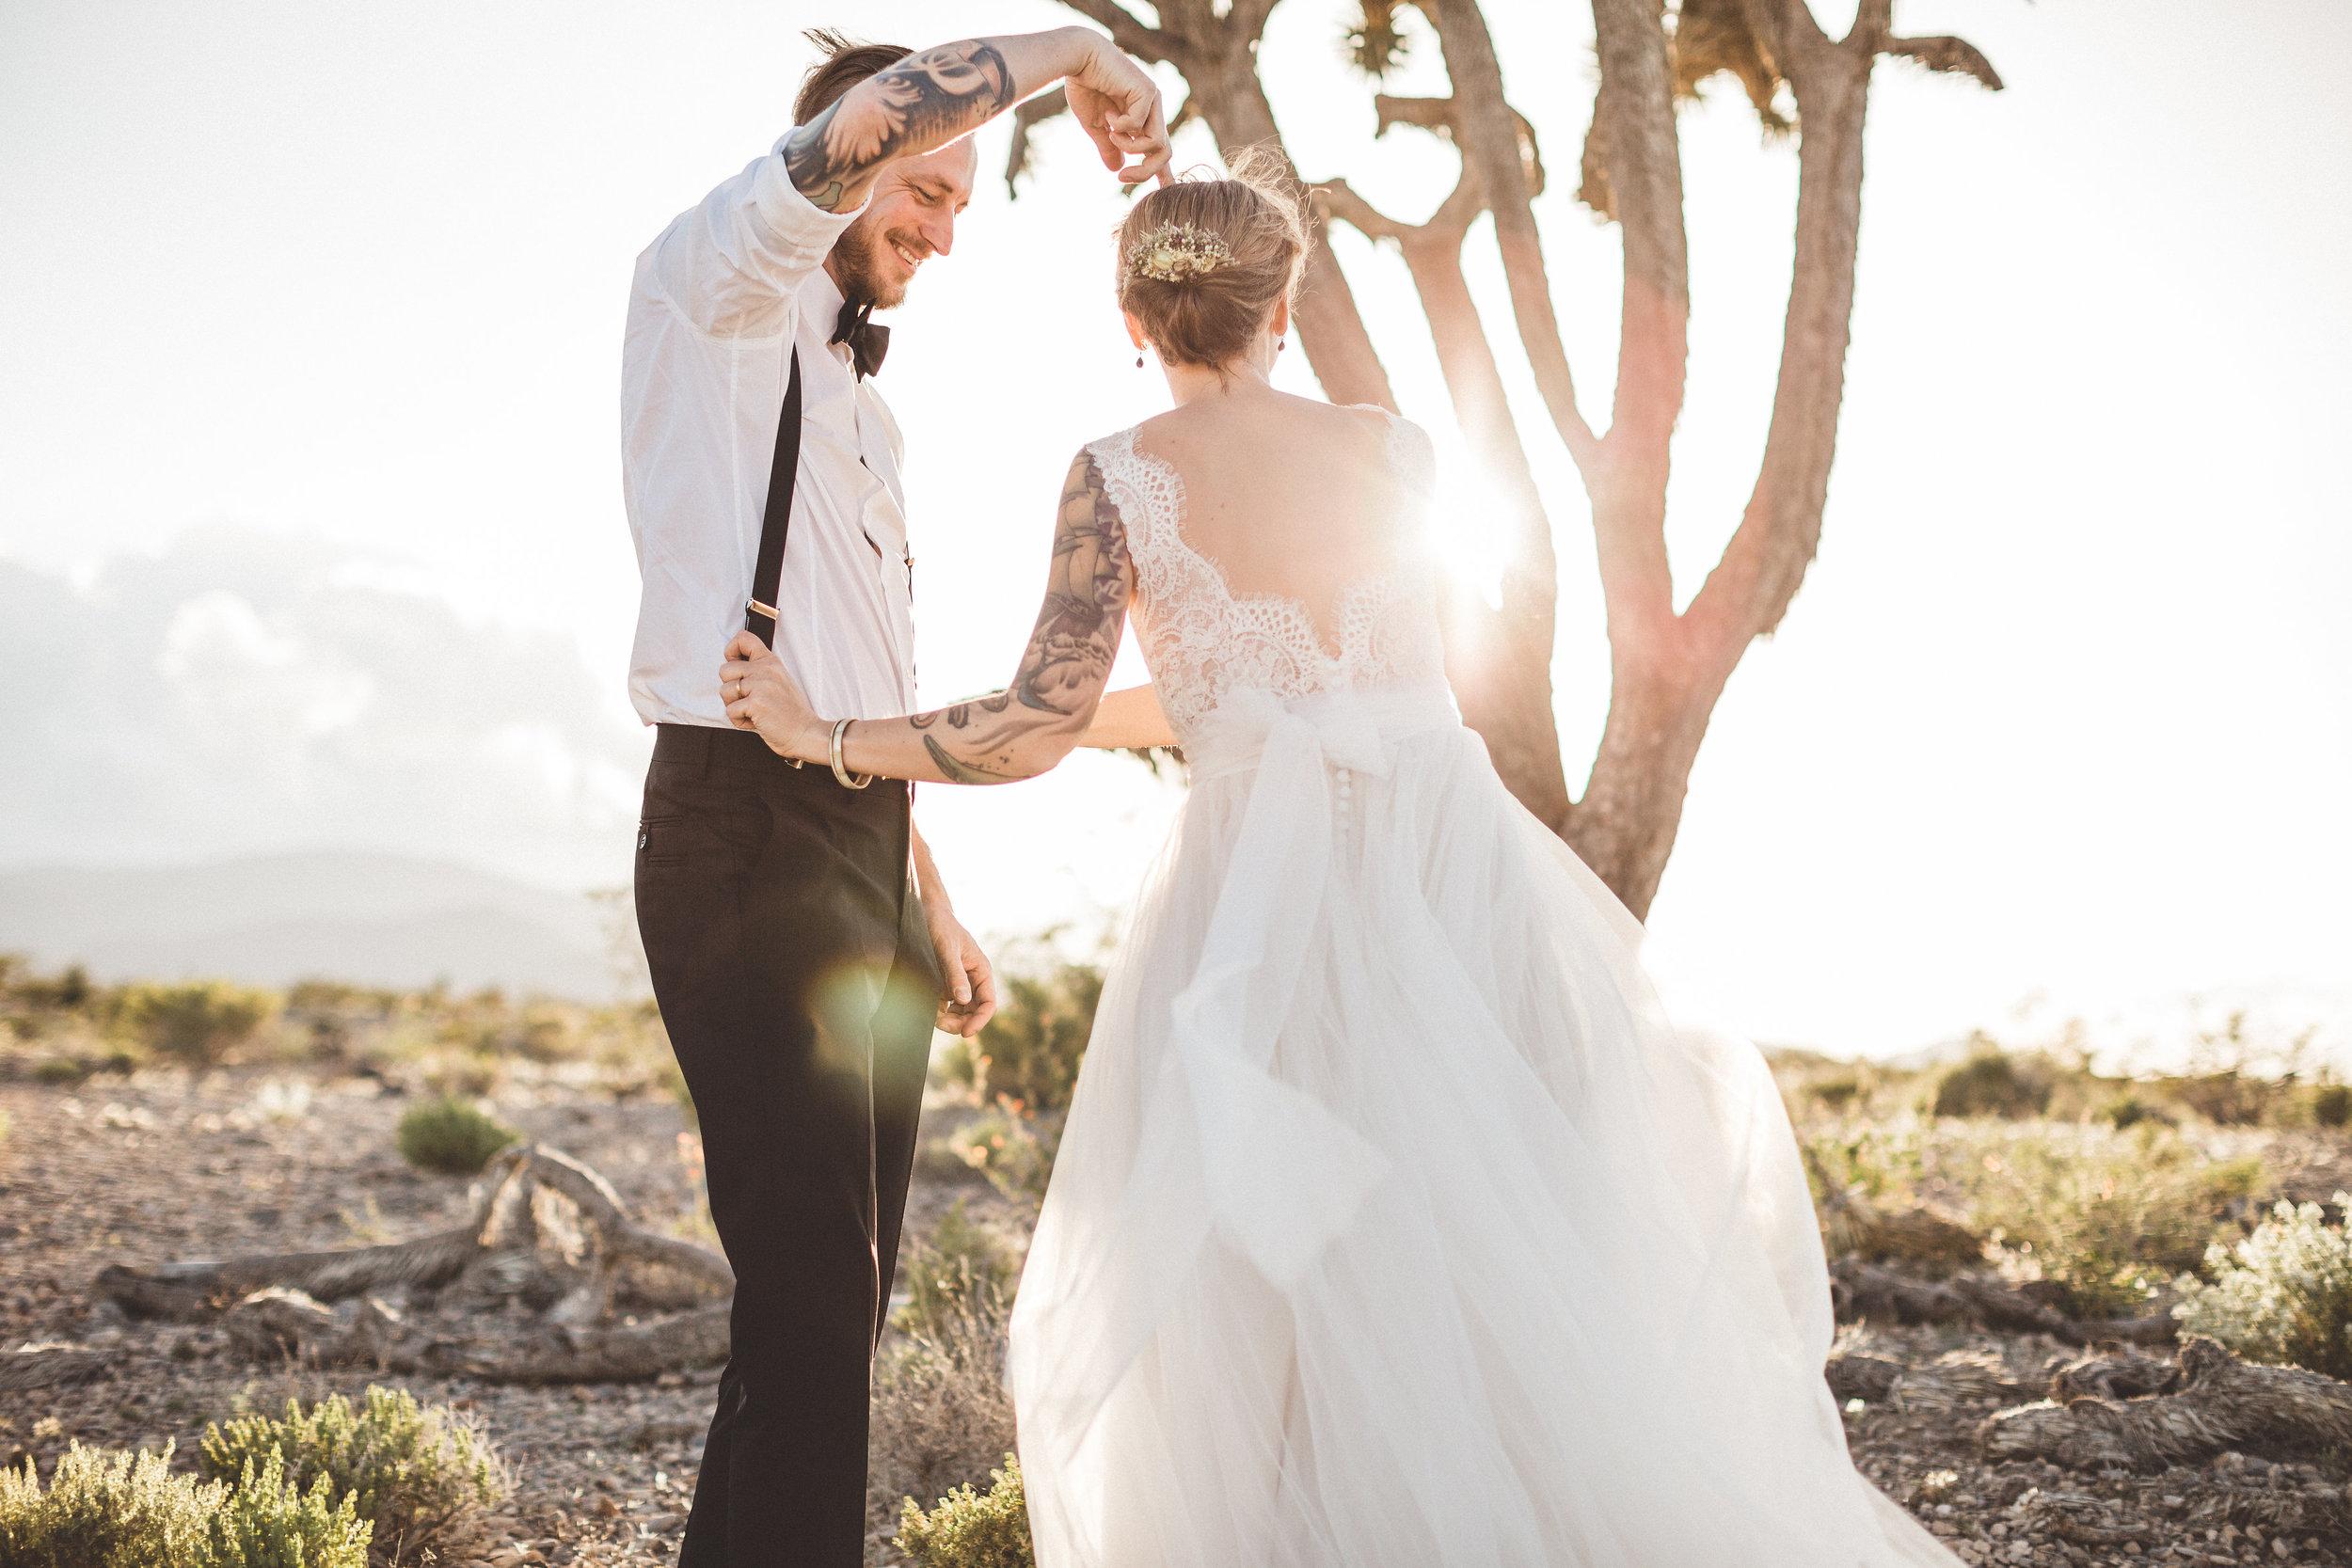 meike-and-rene-las-vegas-desert-elopement26.jpg